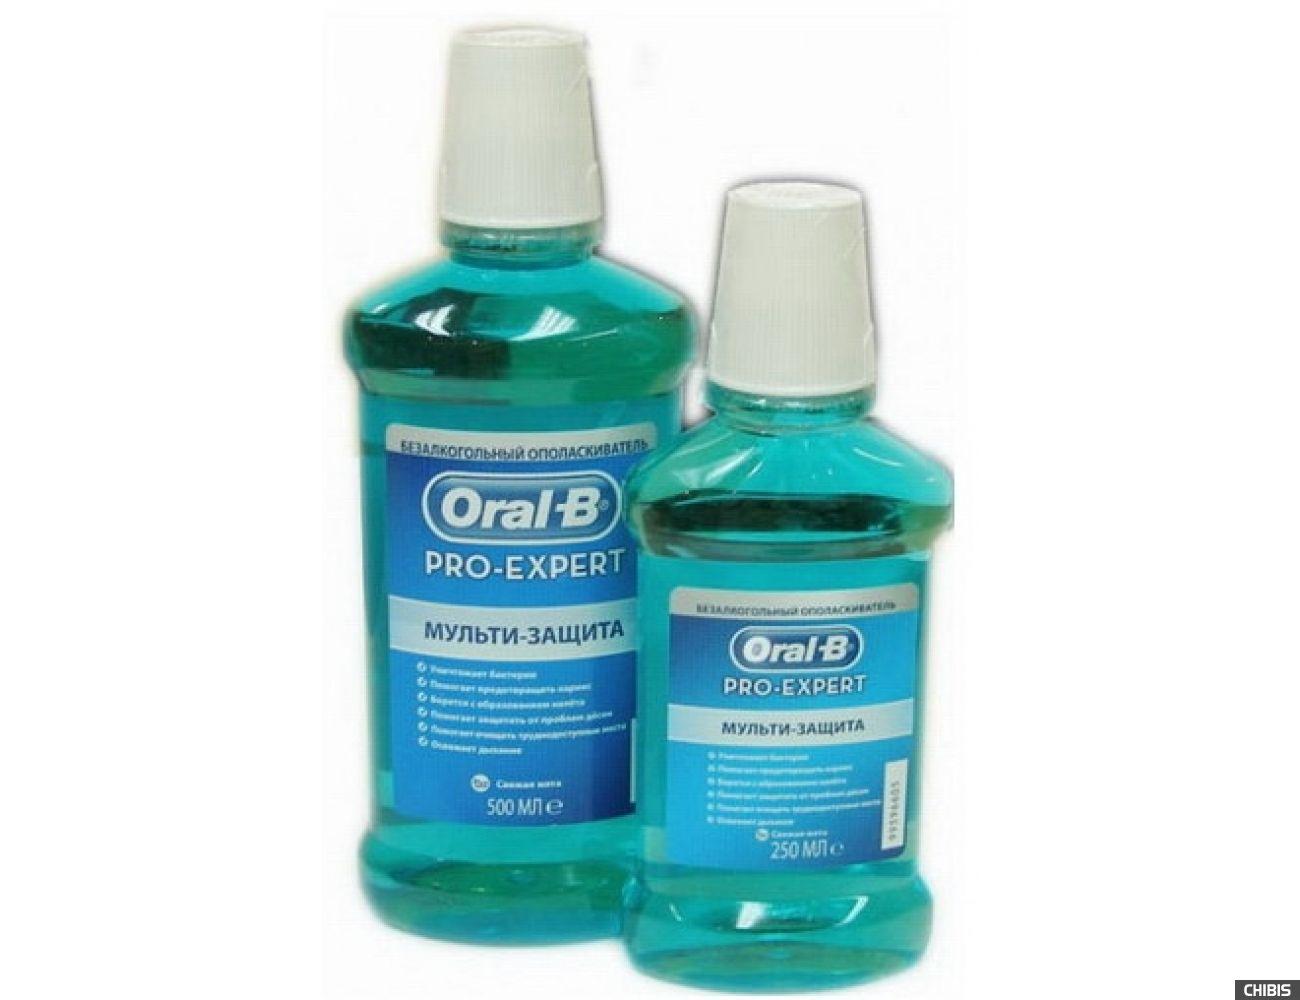 Ополаскиватель Oral-B Pro-Expert Мульти-Защита (250 мл.) 5013965797347